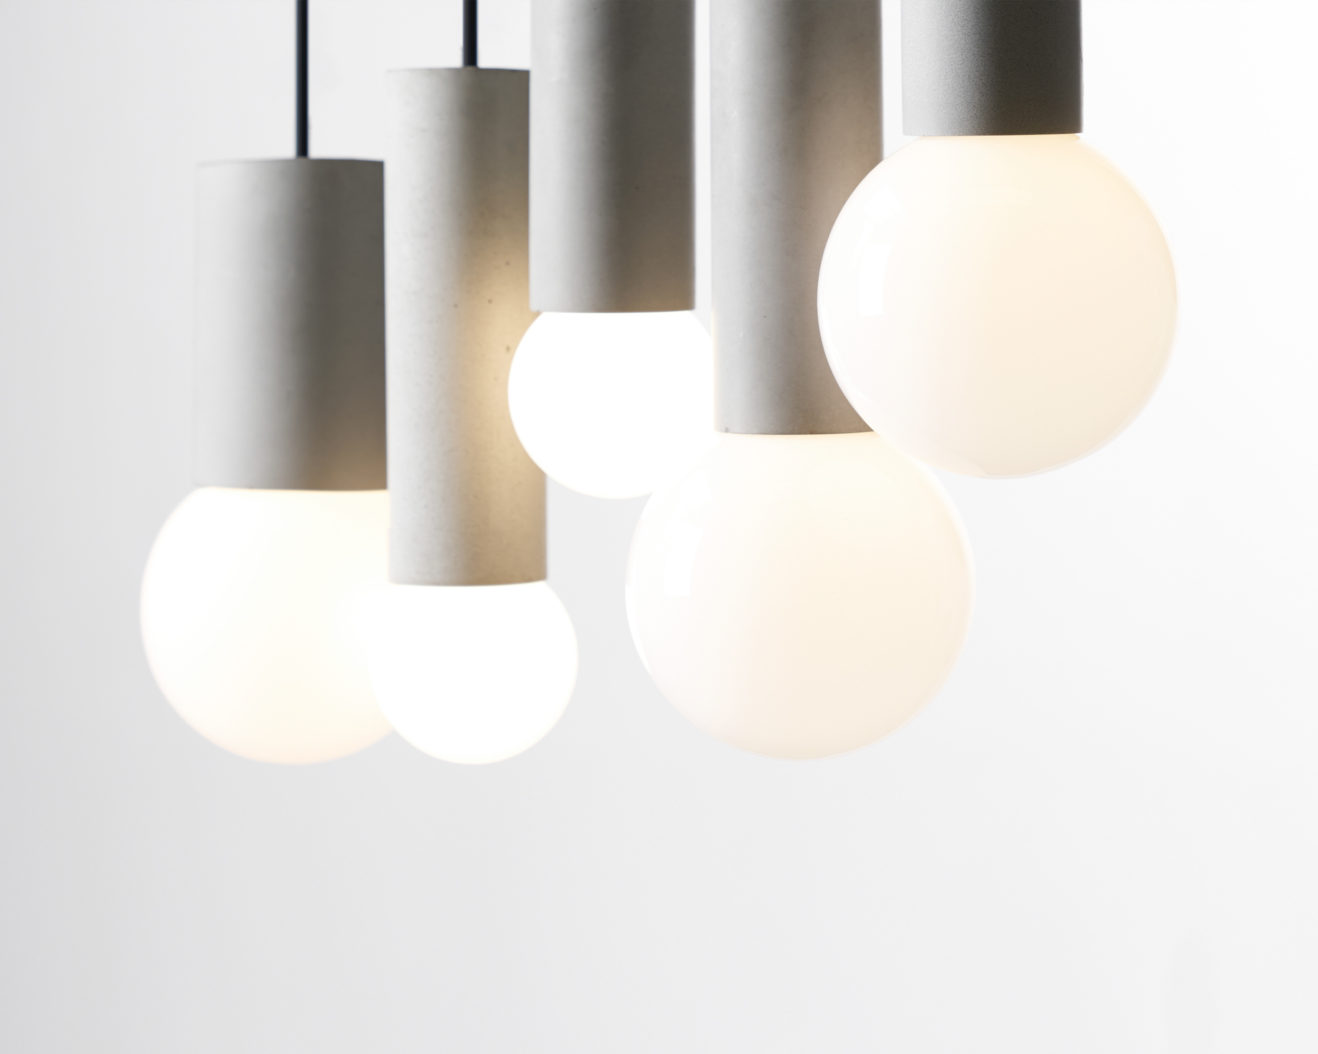 Ball_Bentu_Design_Lamp-1318x1054